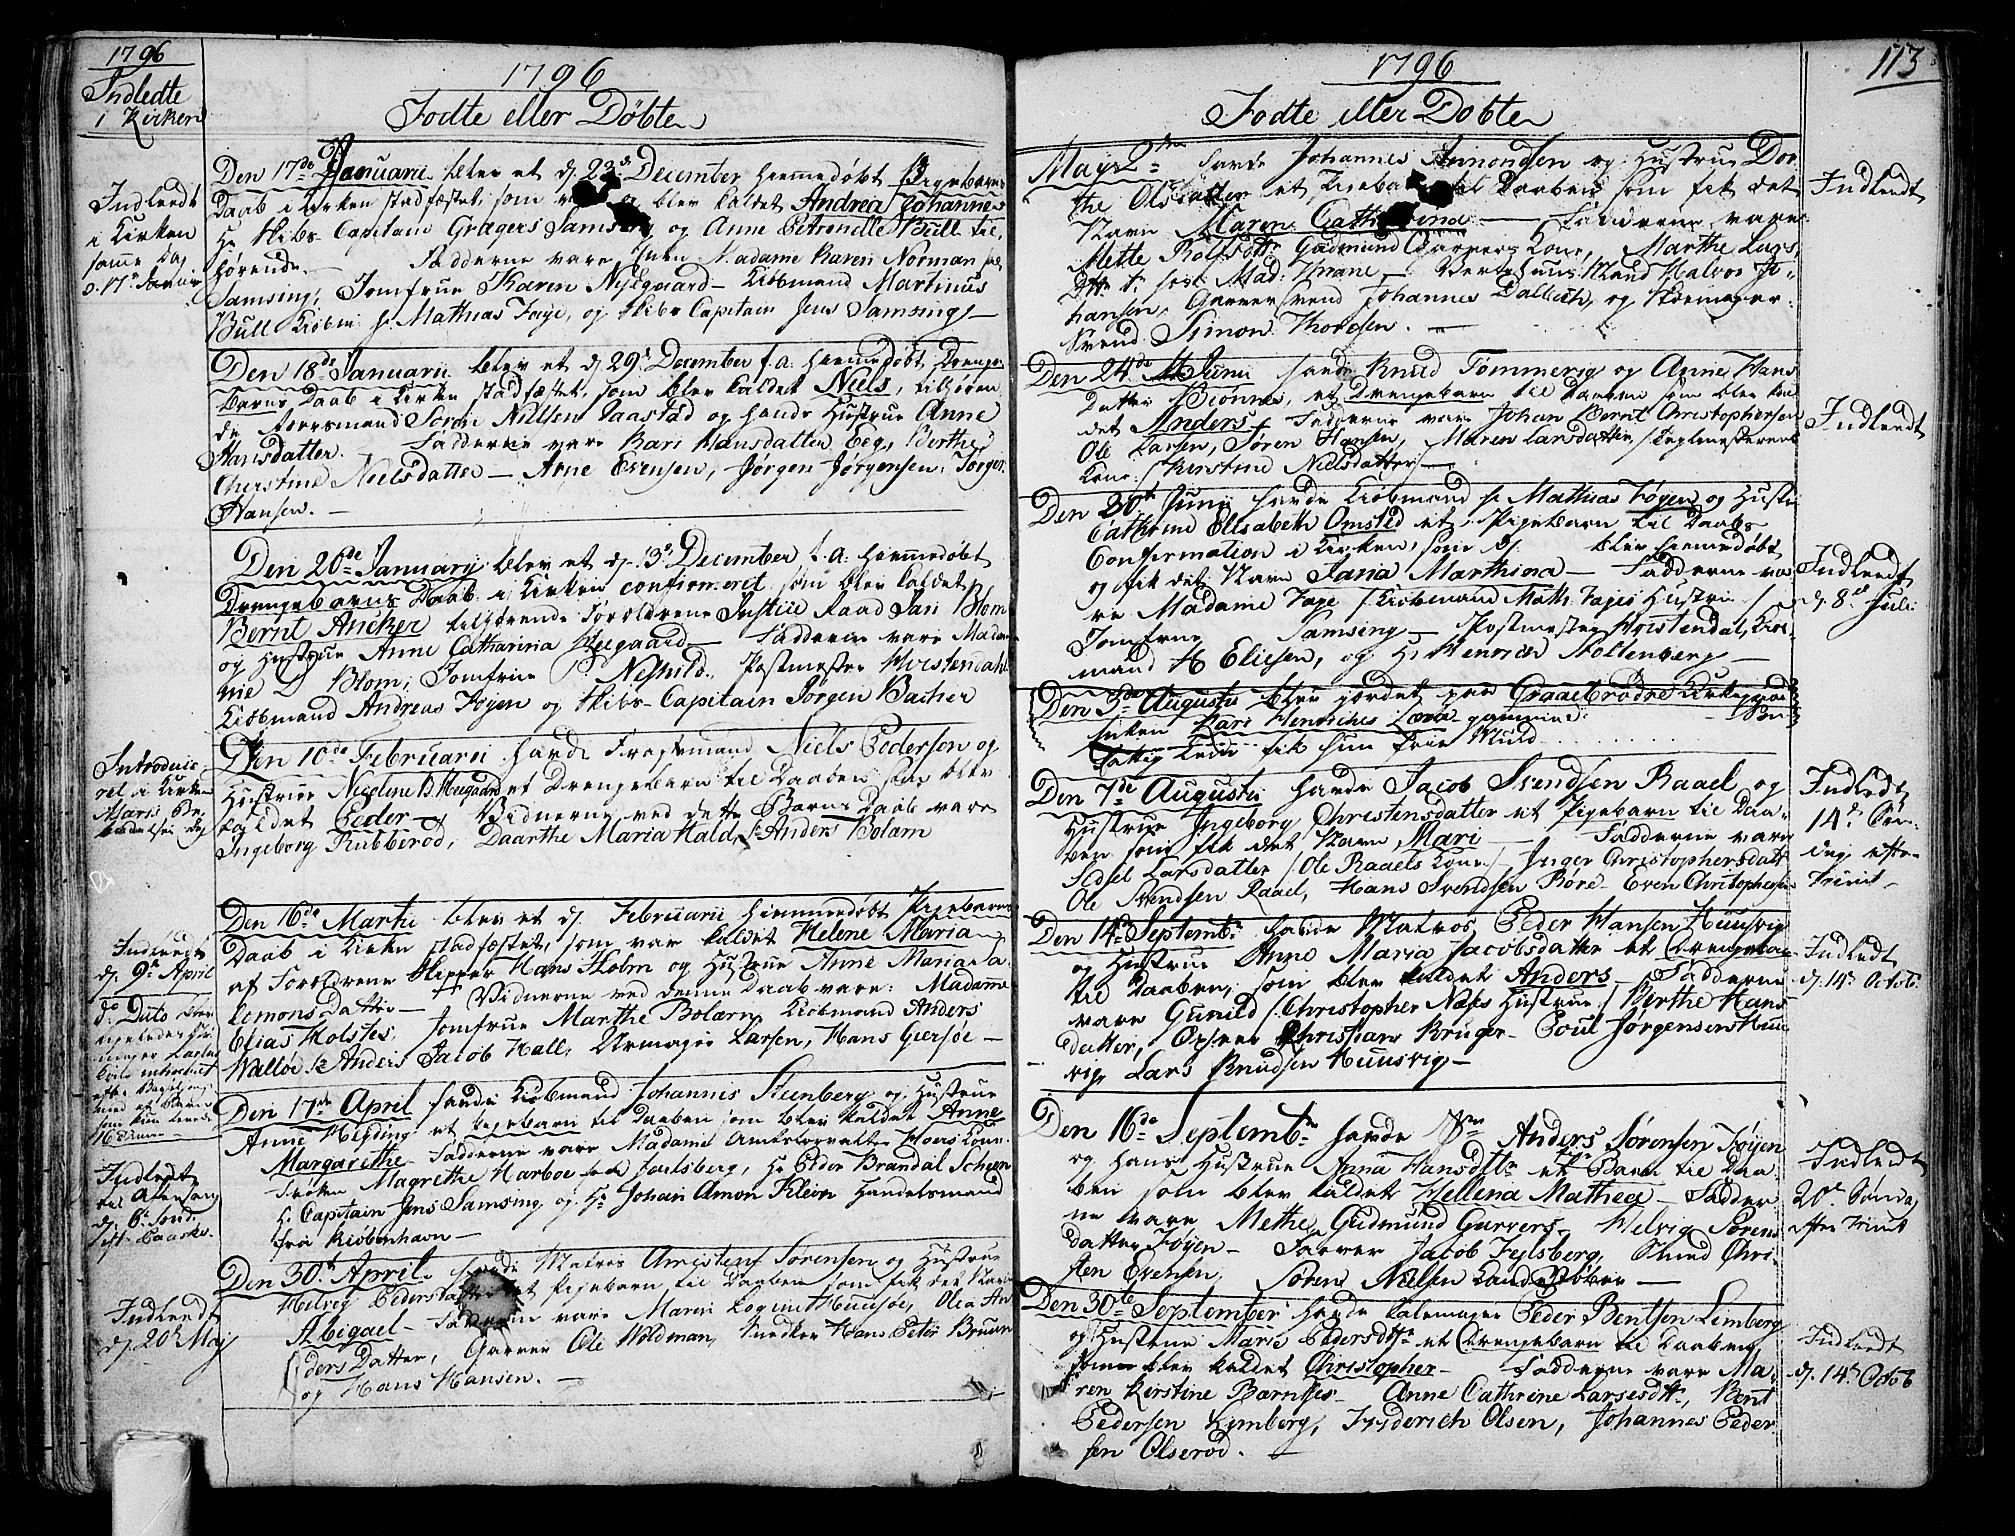 SAKO, Tønsberg kirkebøker, F/Fa/L0002: Ministerialbok nr. I 2, 1760-1796, s. 113